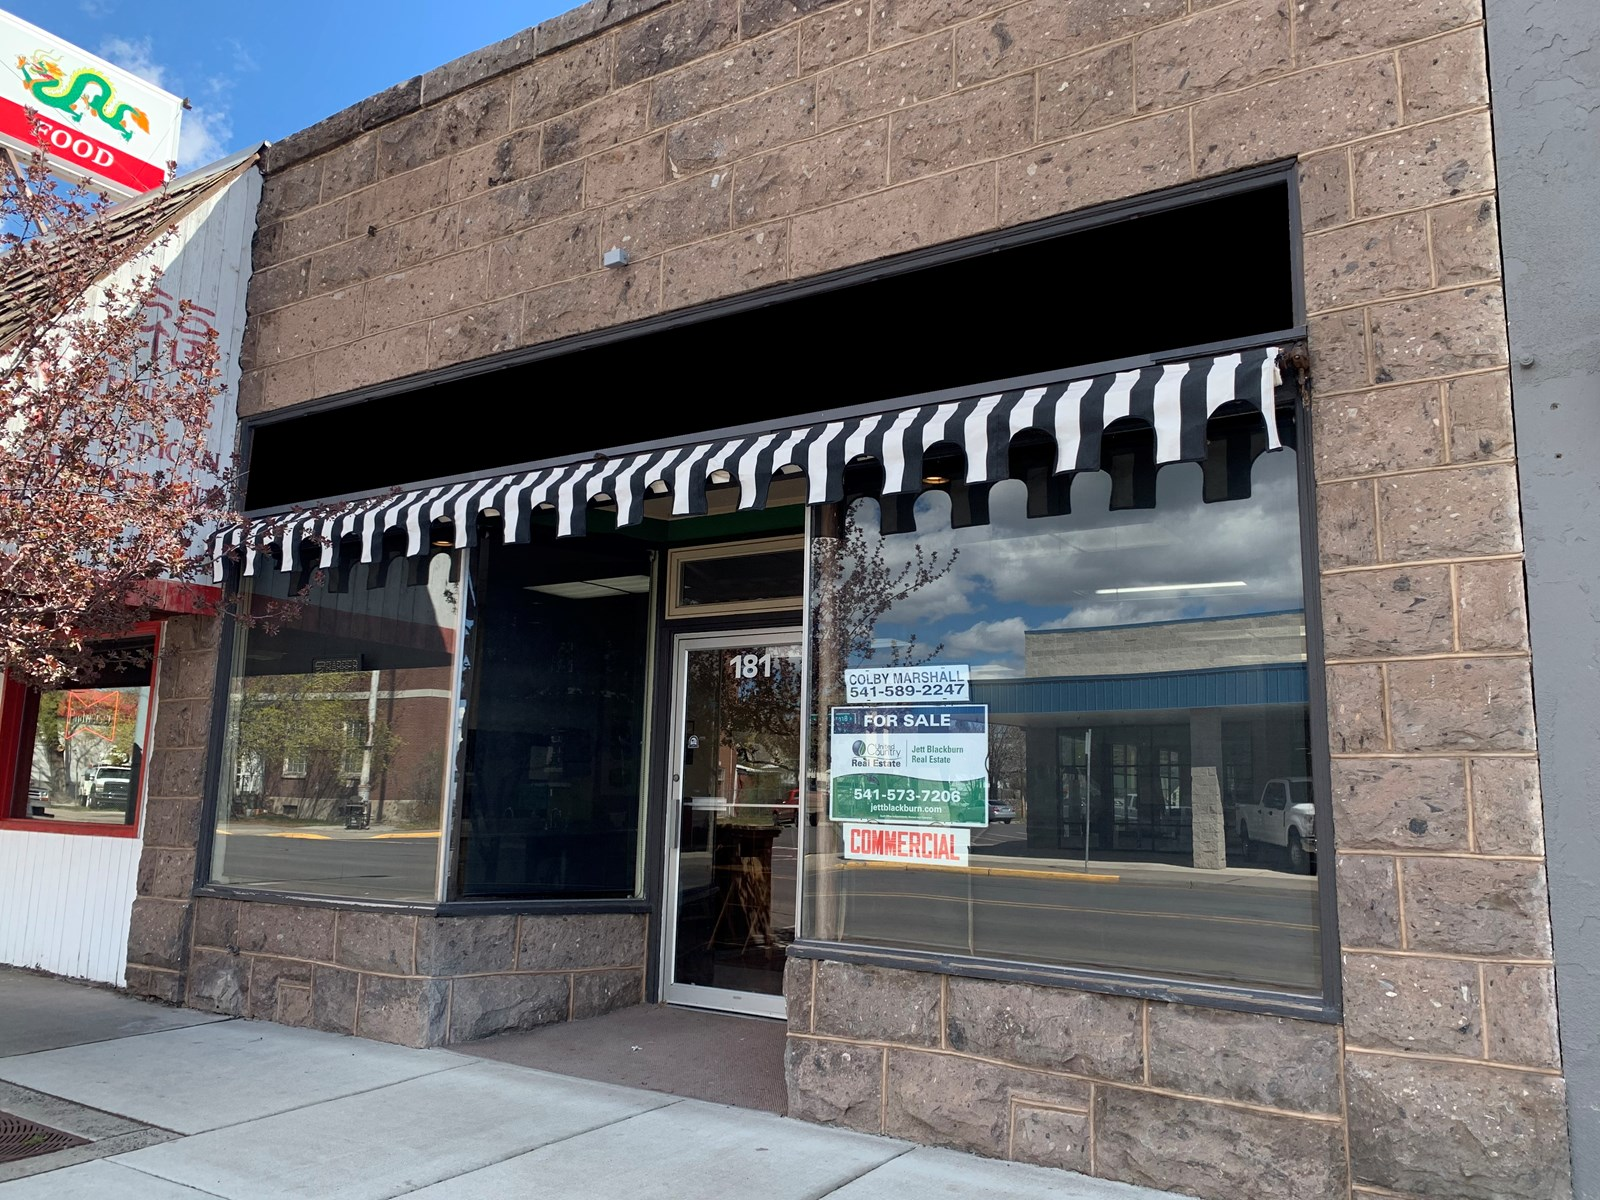 Burns Broadway Business - 181 N Broadway Ave, Burns OR 97720